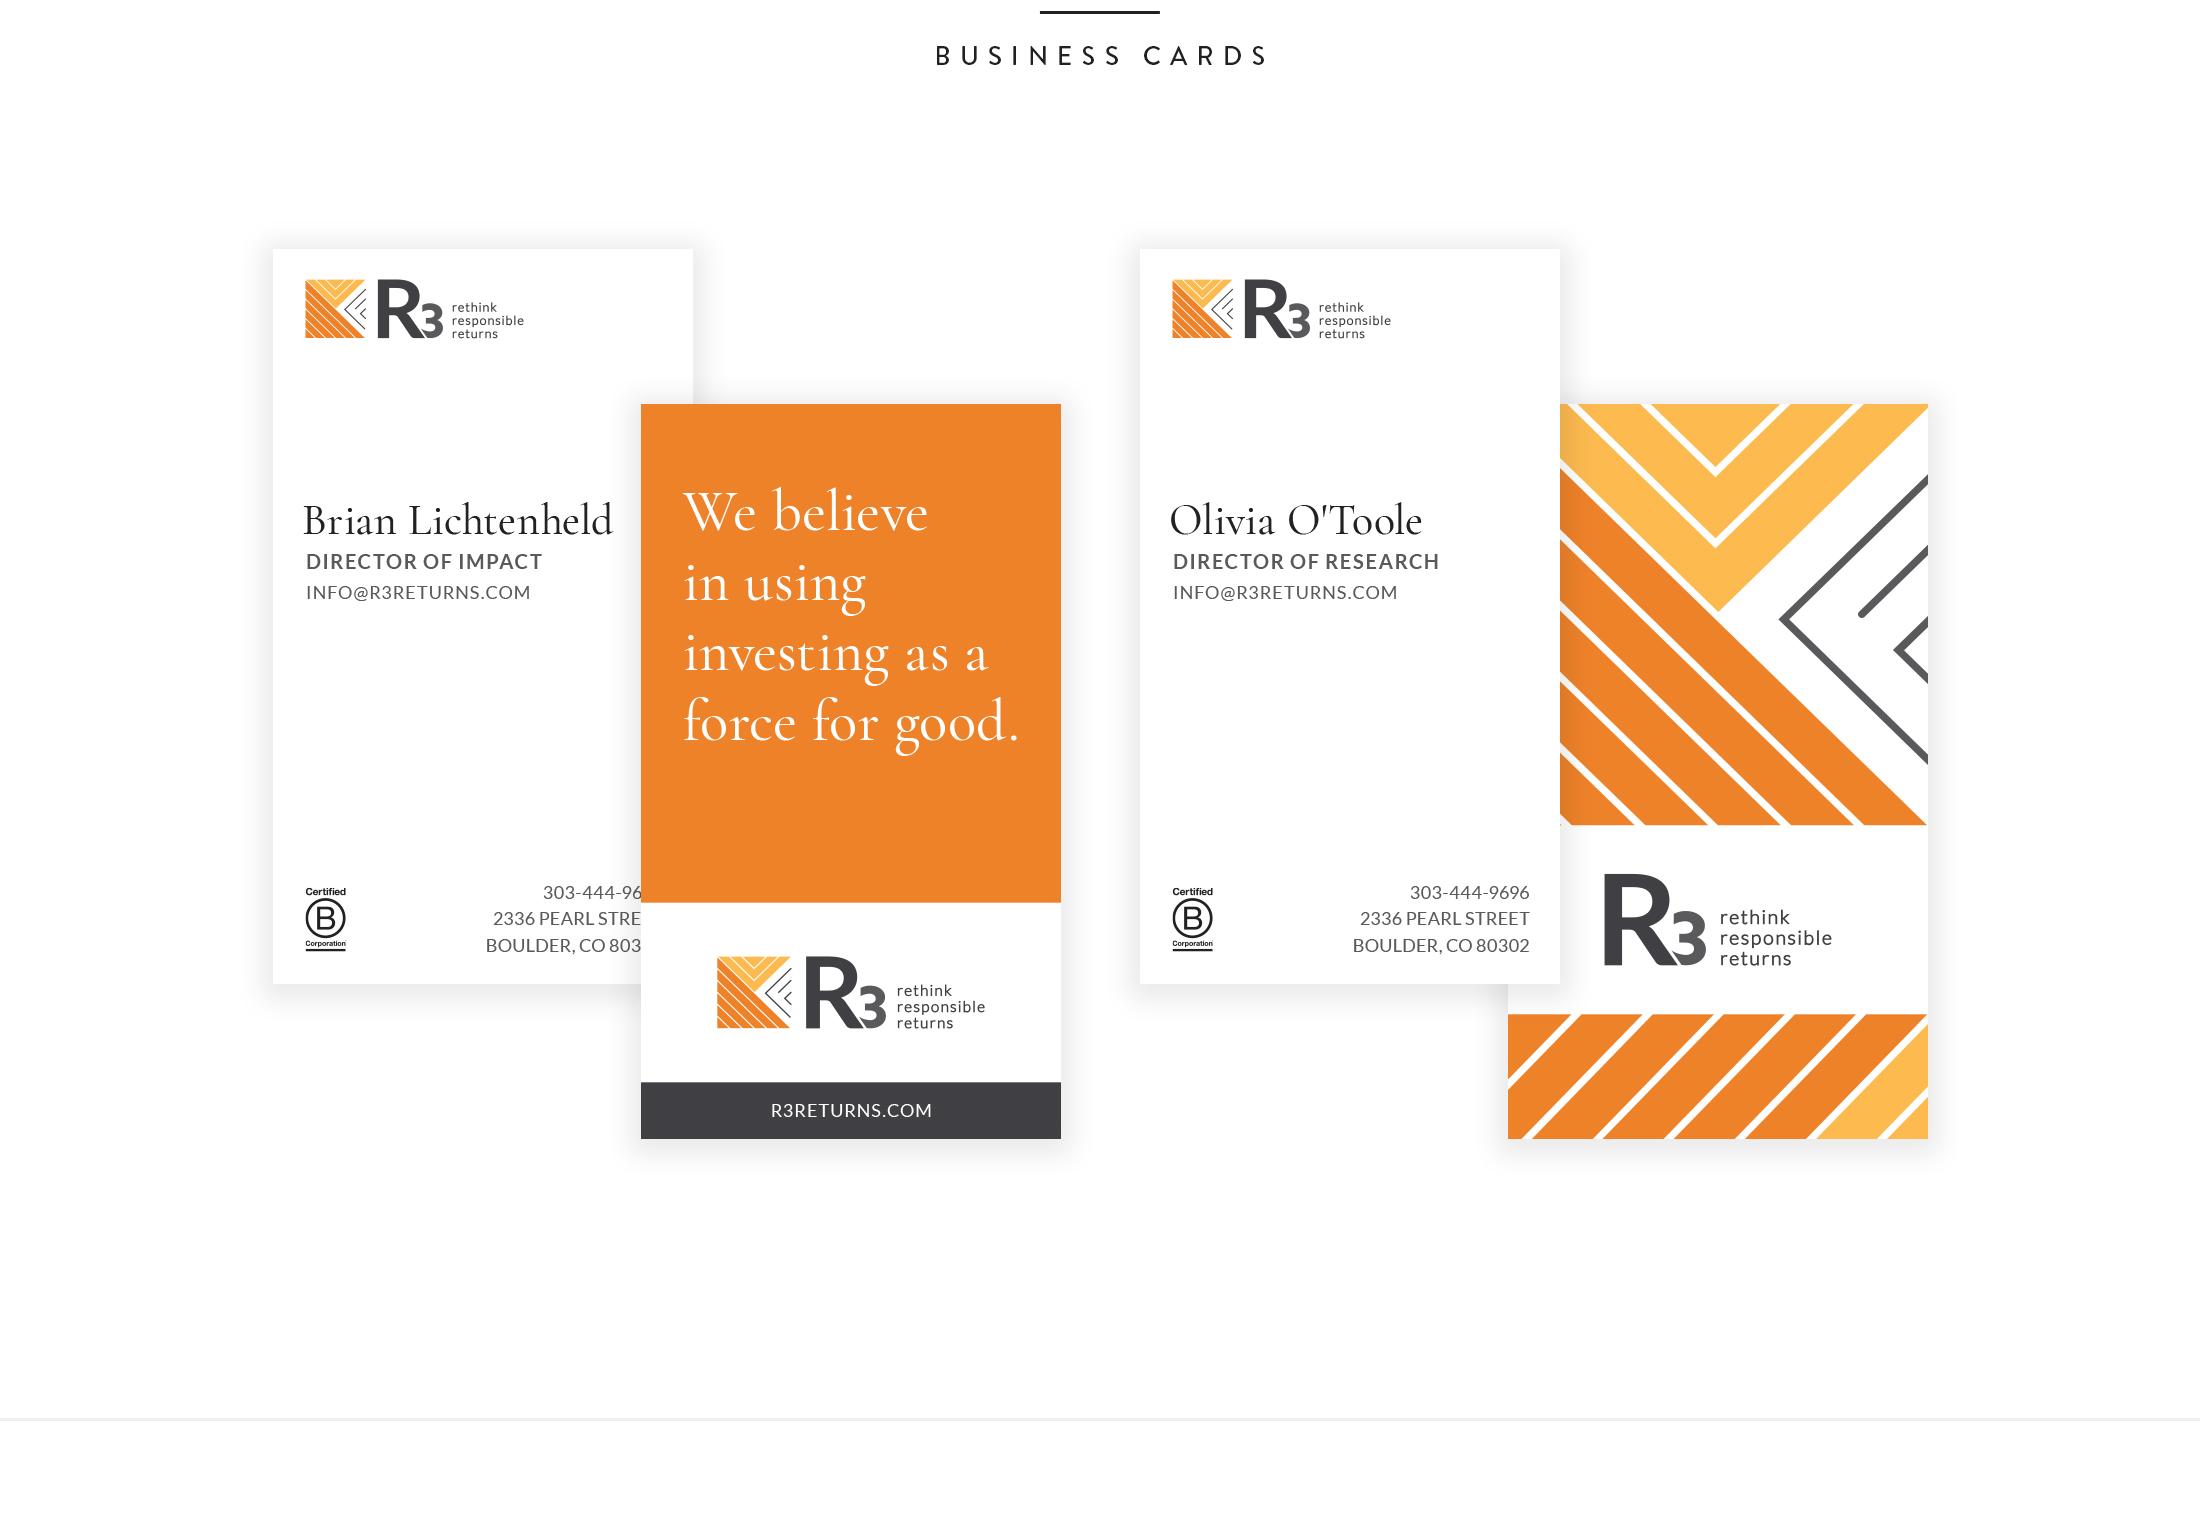 r3-returns-businesscards.jpg